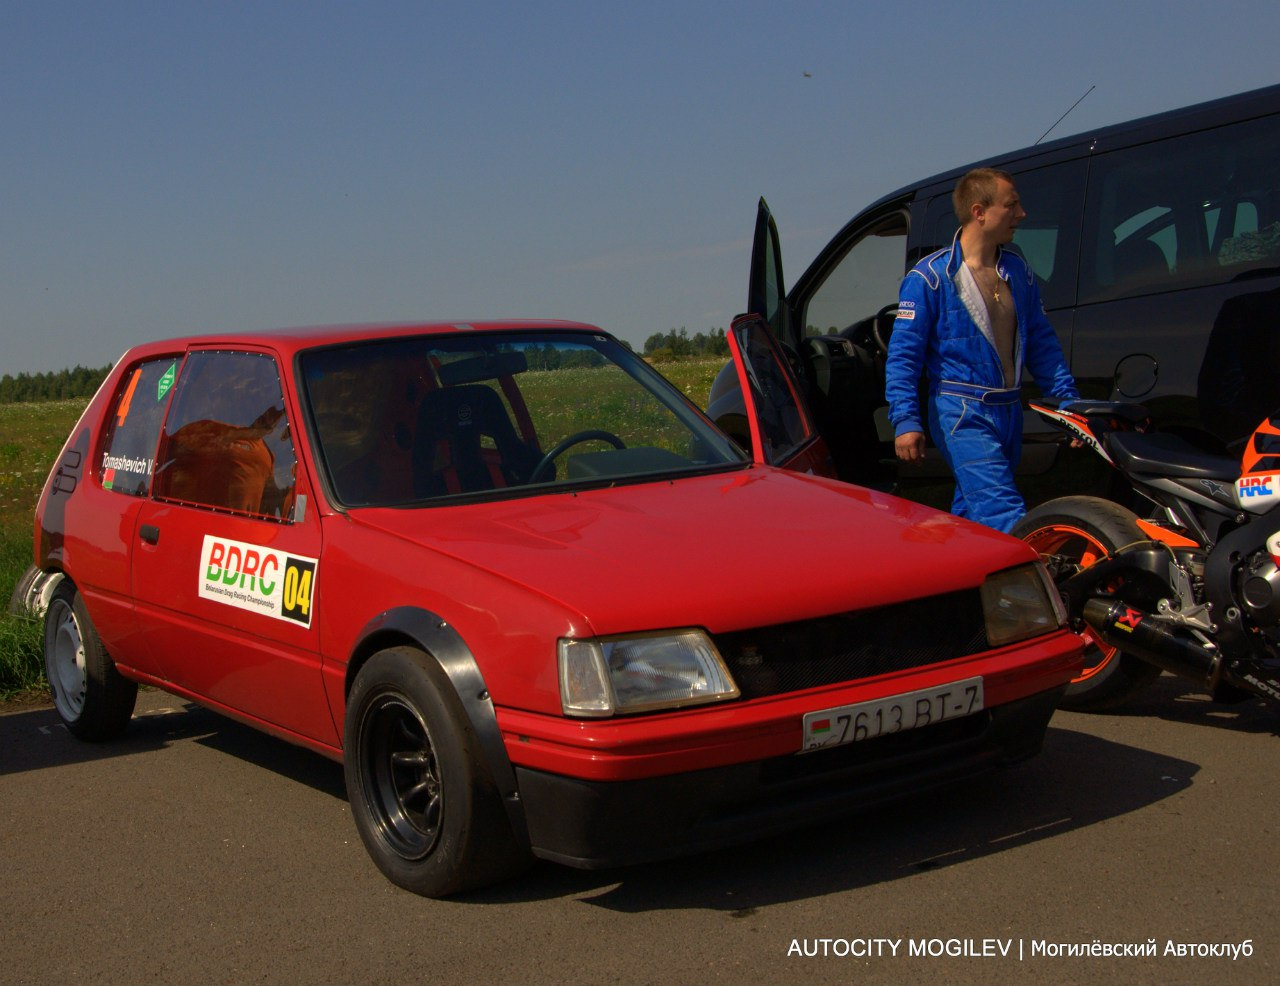 Томашевич Виталий -  Peugeot 205 (г. Минск)